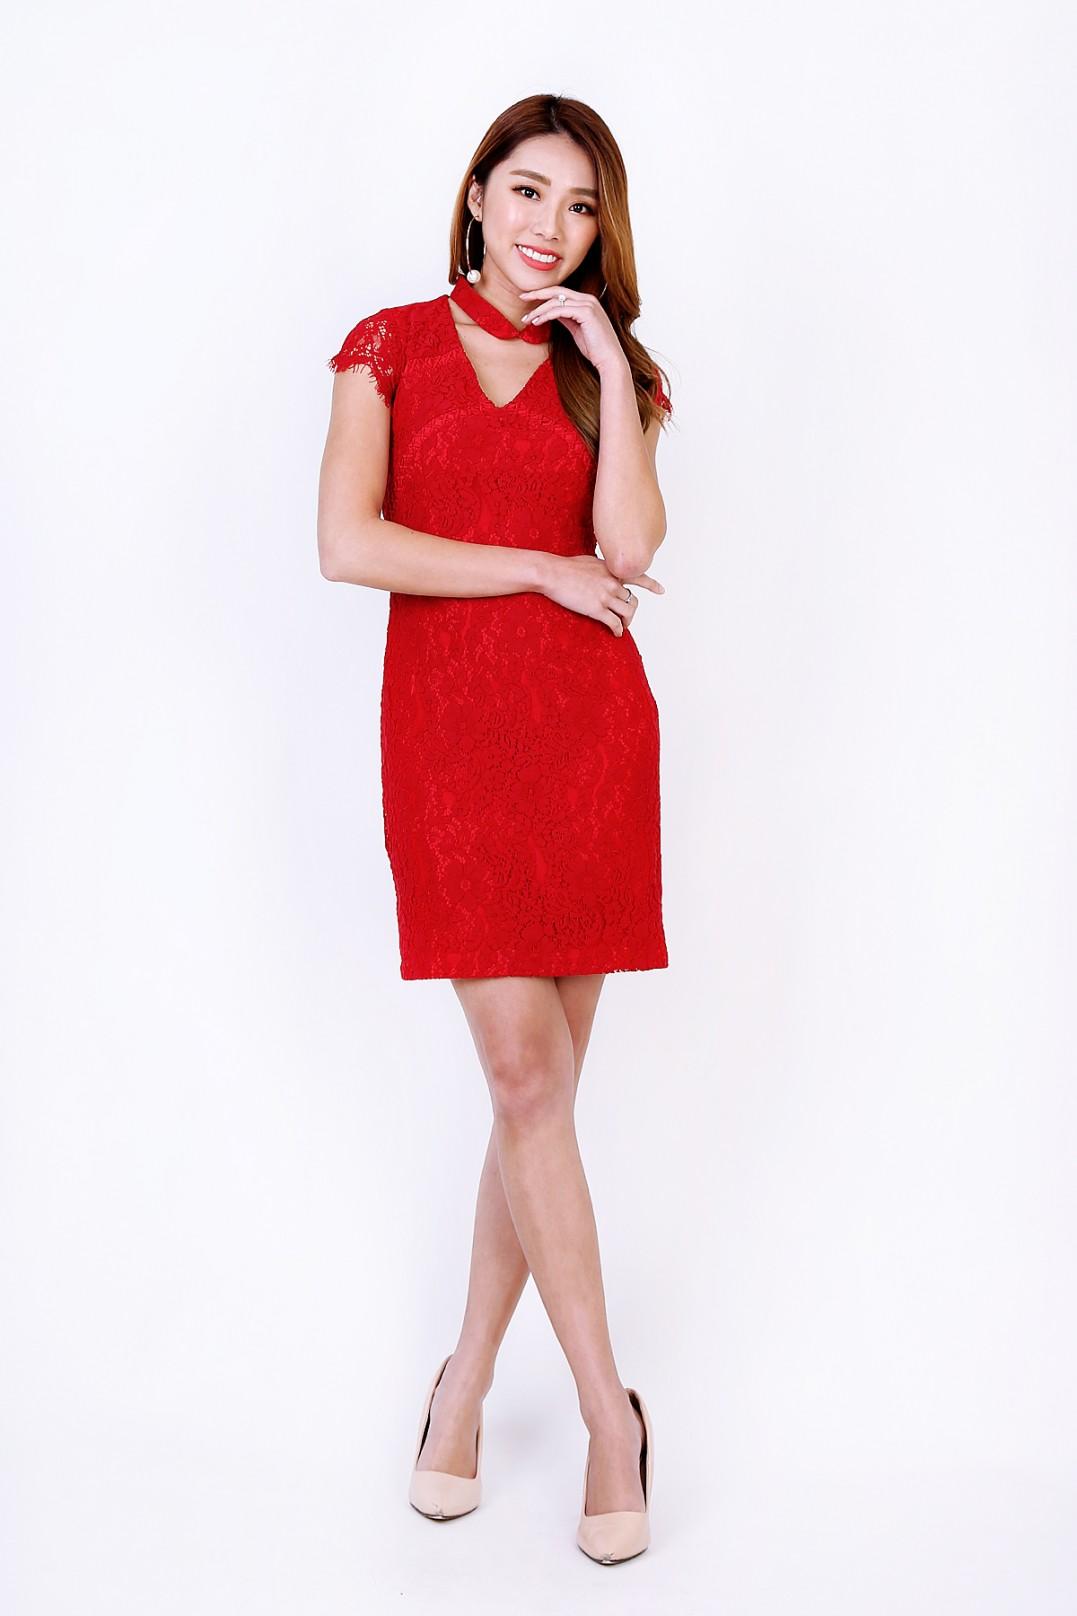 b146c64701711 RESTOCK: Magnolia Lace Dress in Red - MGP